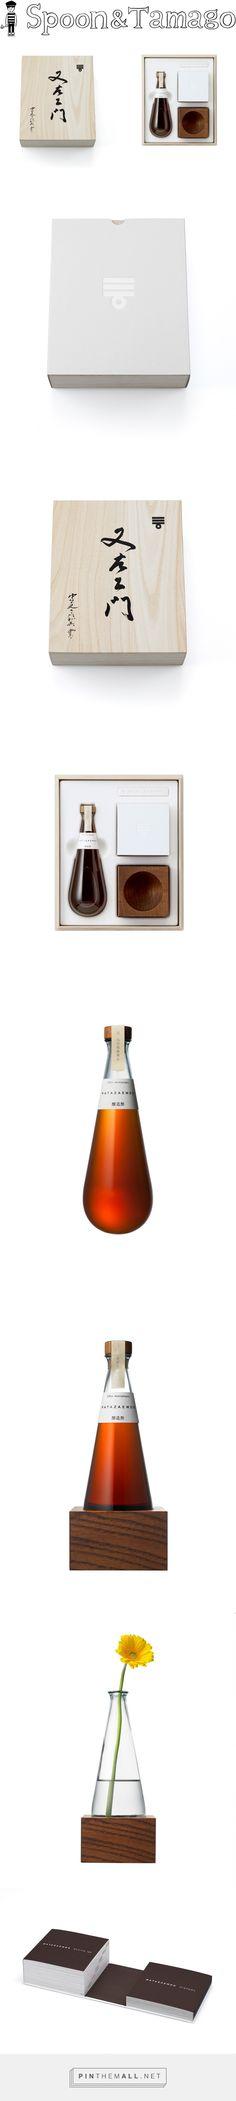 Packaging Design for Mizkan Vinegar by Taku Satoh via Spoon & Tamago curated by Packaging Diva PD.